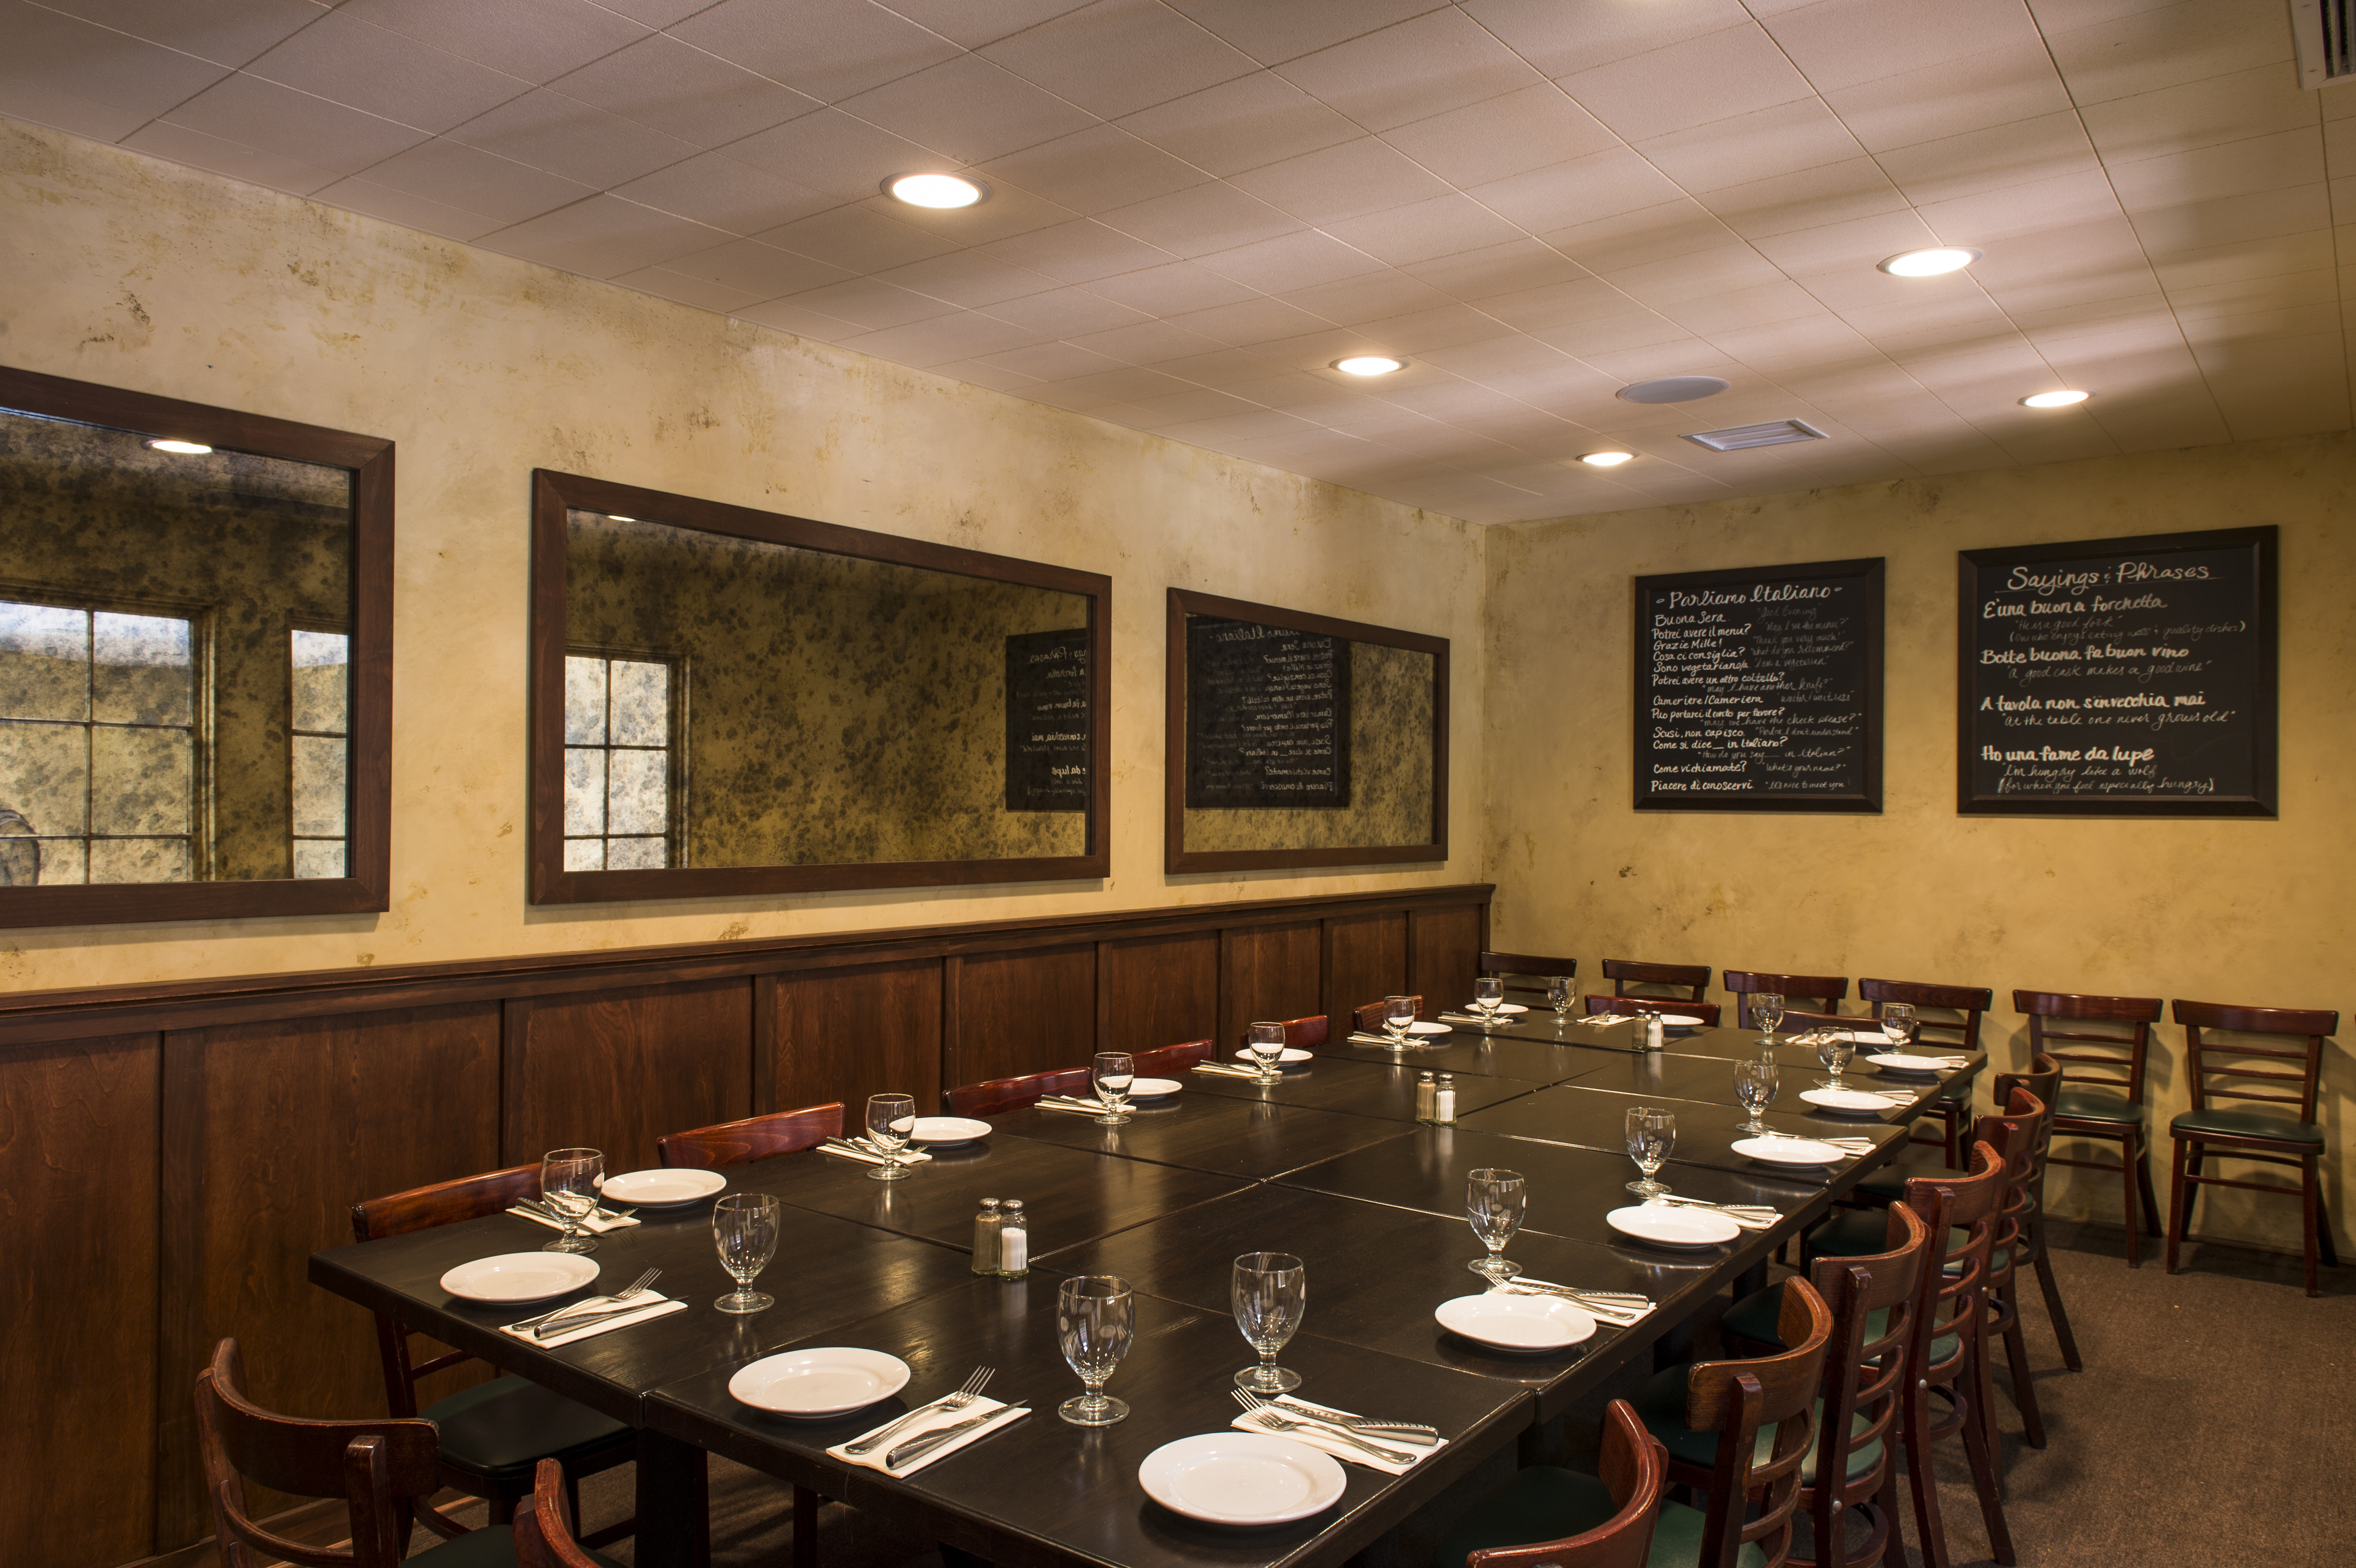 Terrazza Room Olio Pizzeria